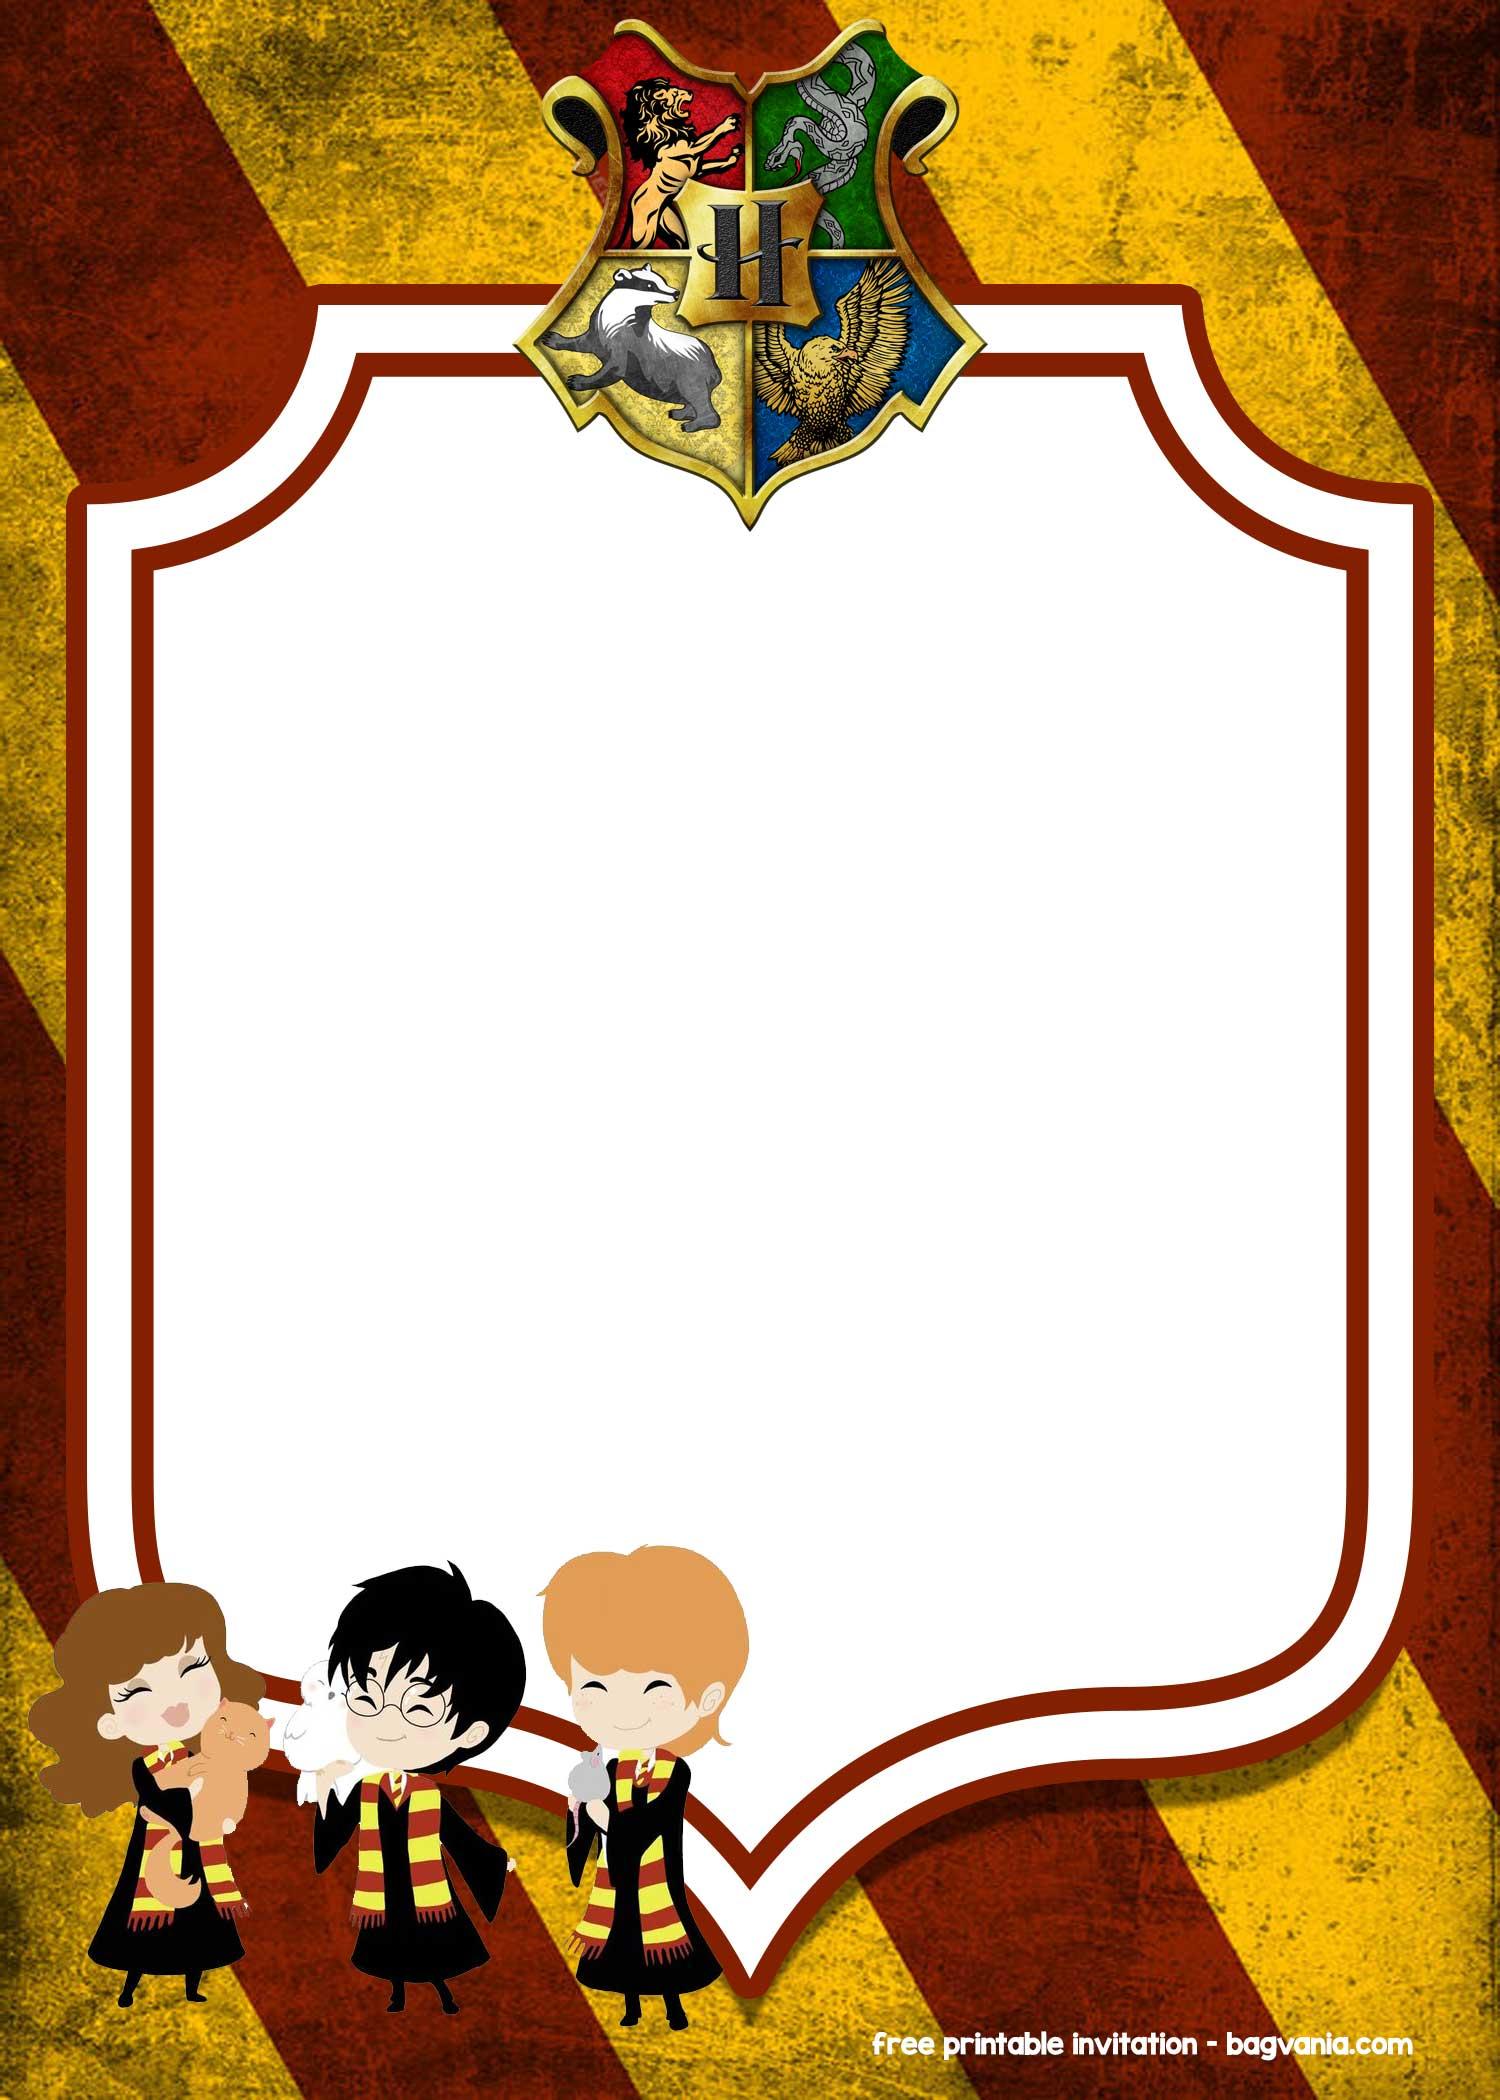 FREE Printable Harry Potter Invitation Templates FREE Printable Birthday Invitation Templates